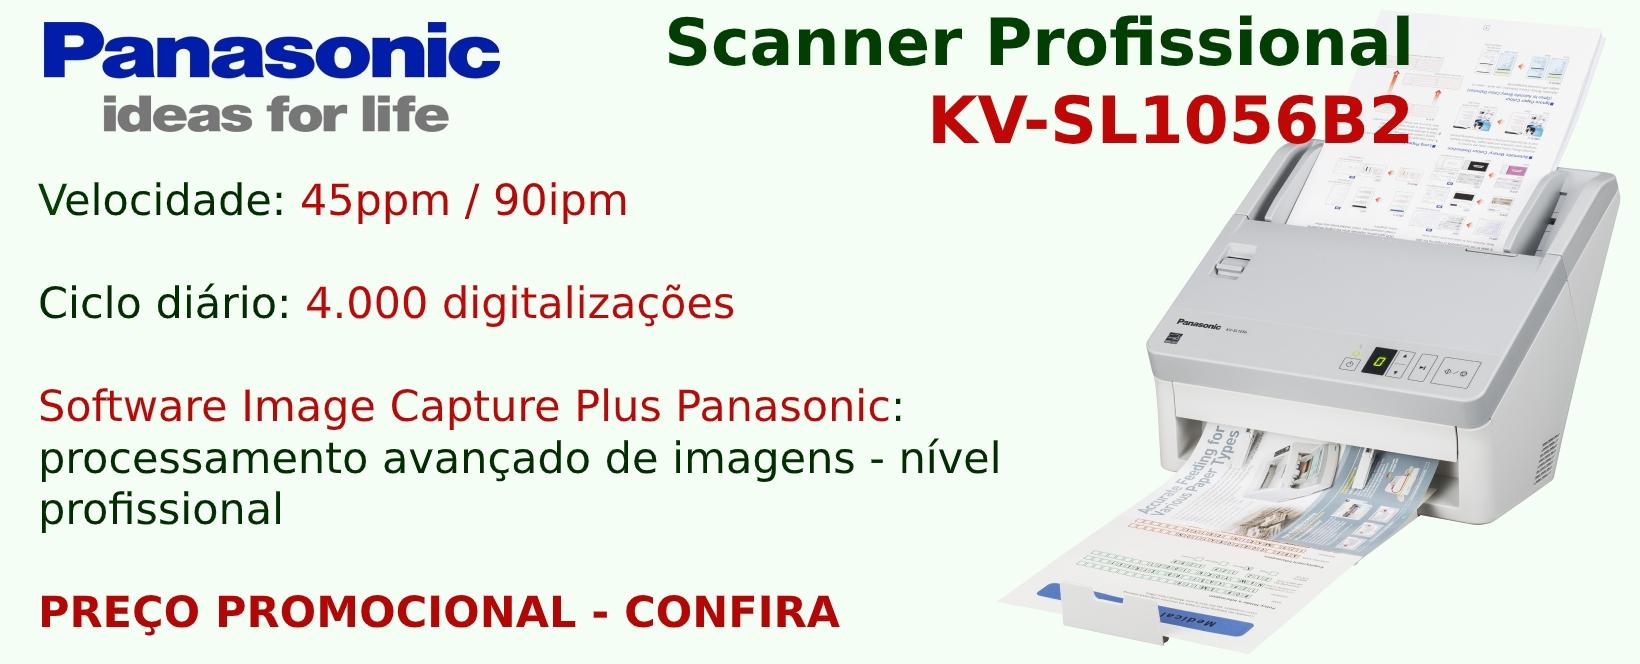 KVSL1056B2